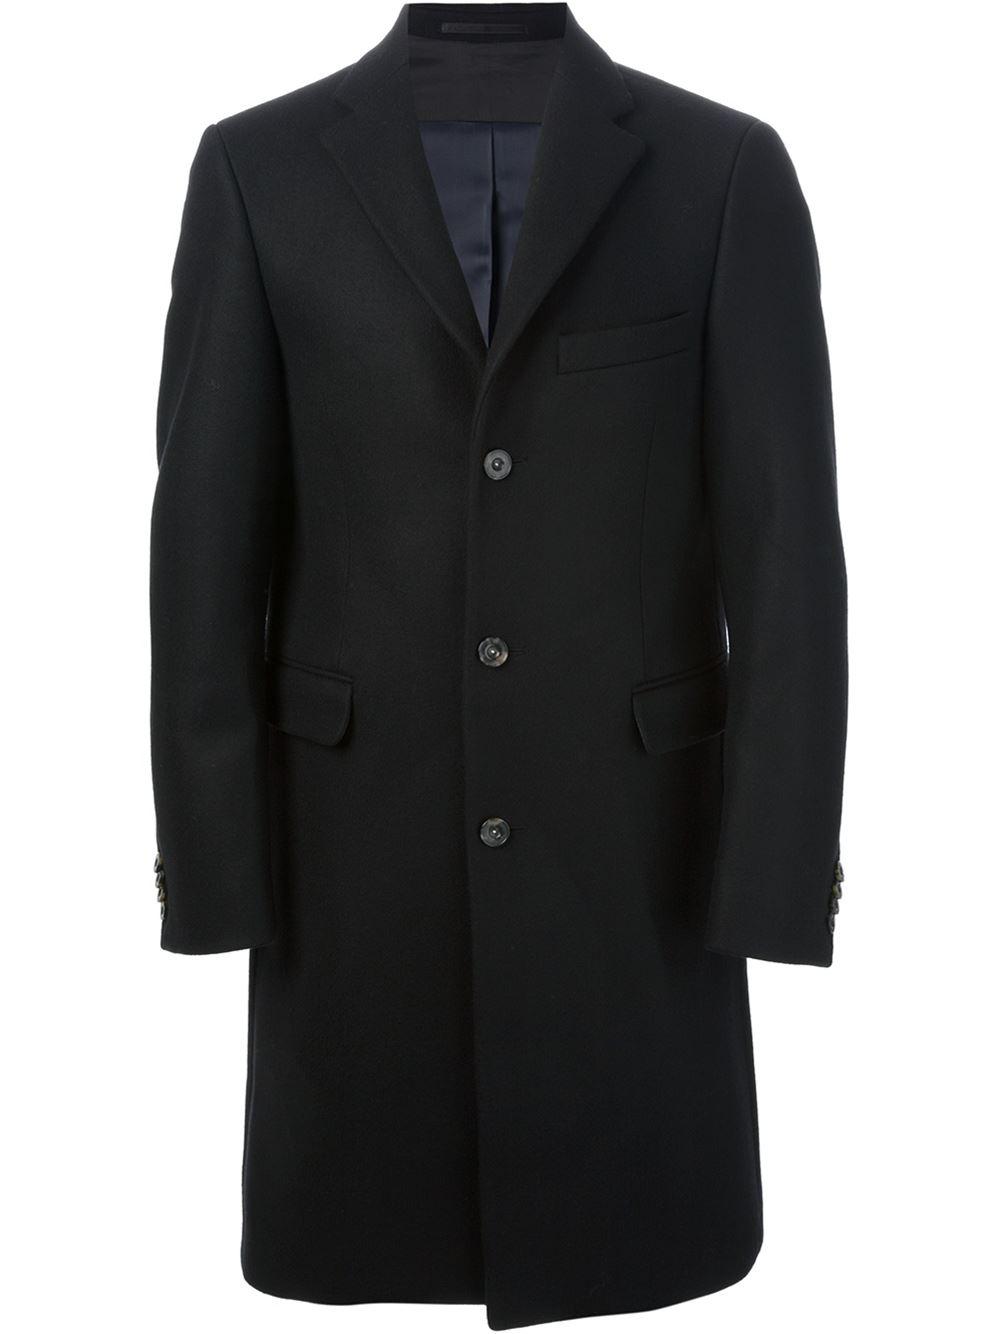 Lyst Acne Studios Garret Coat In Black For Men